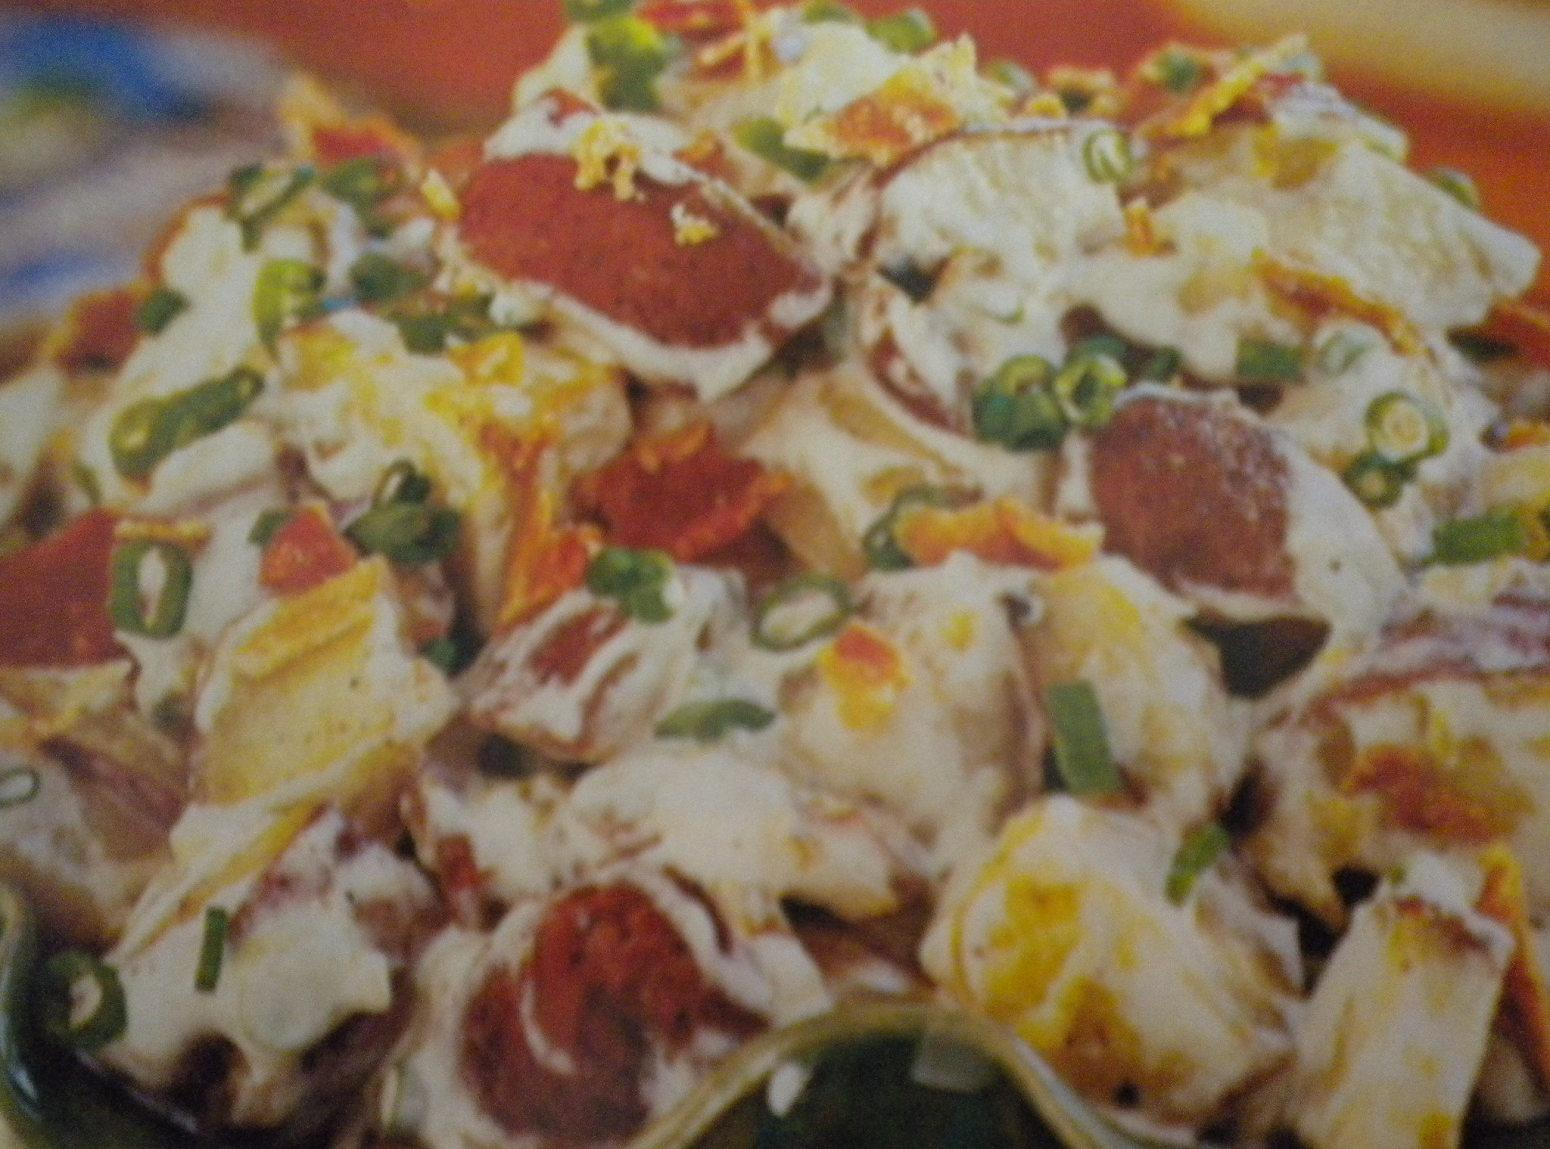 Roasted New Potato Salad Recipe | Just A Pinch Recipes